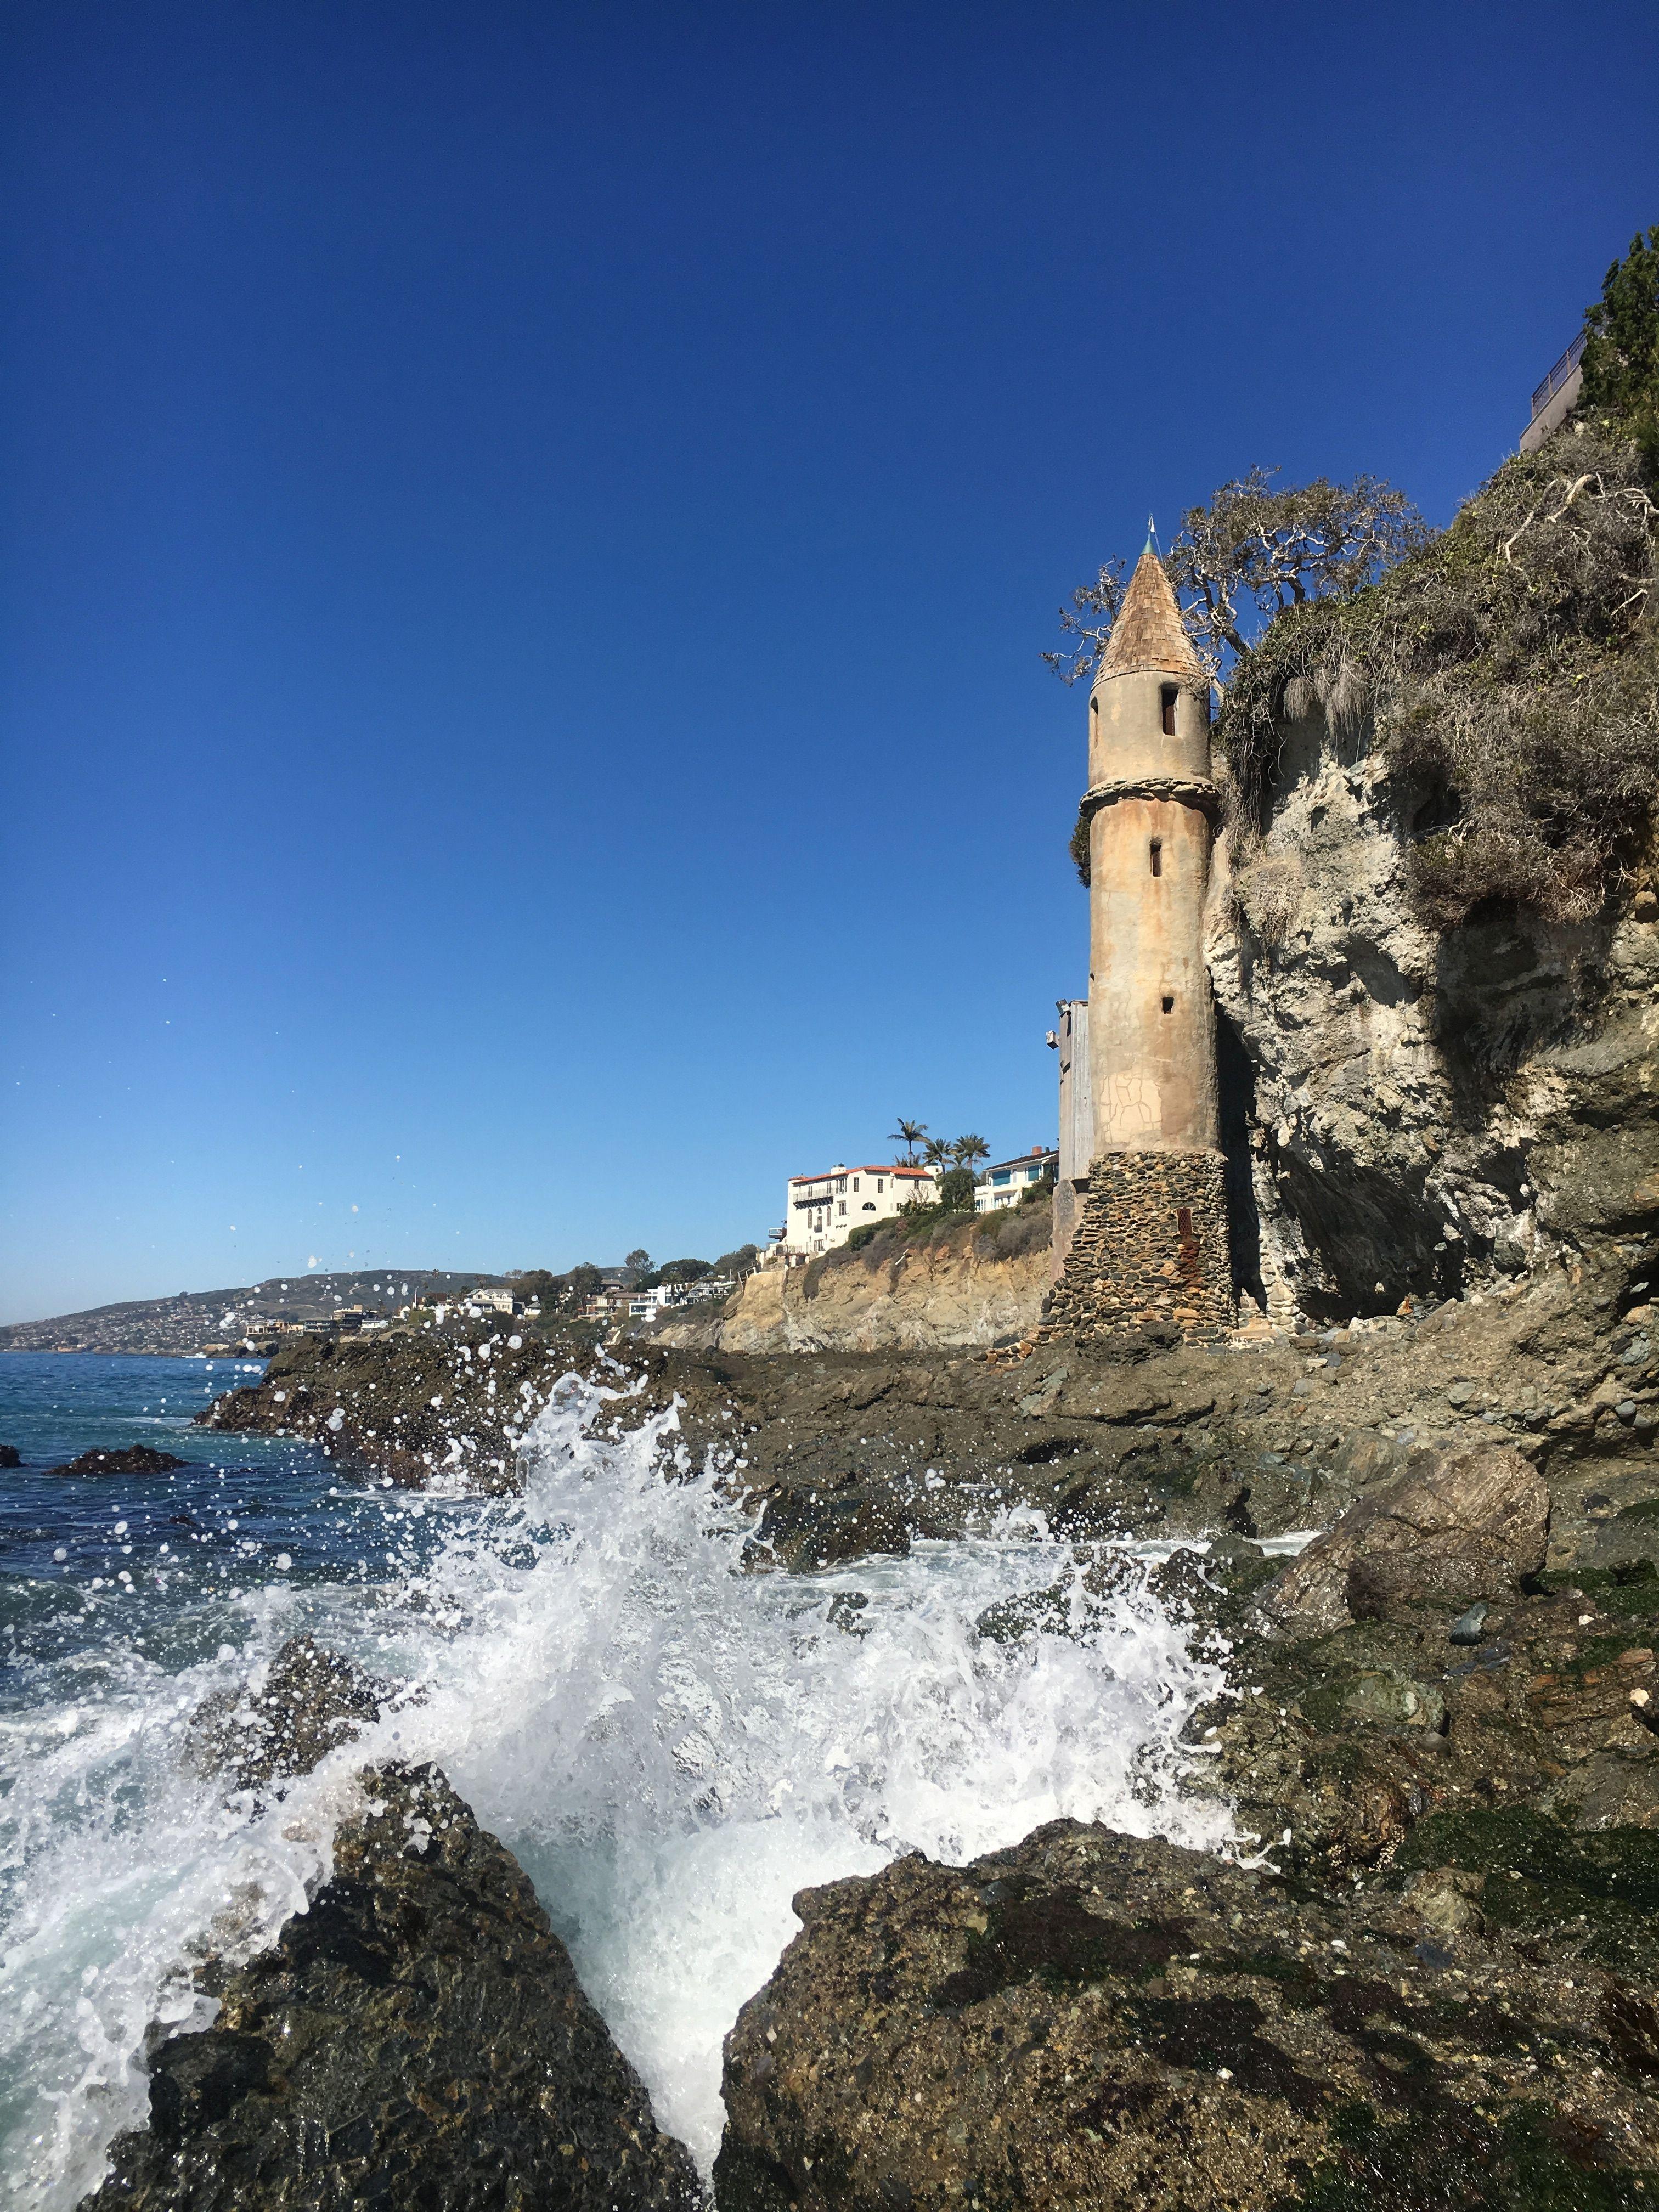 Some Of The Best Hidden Spots In Laguna Beach, CA